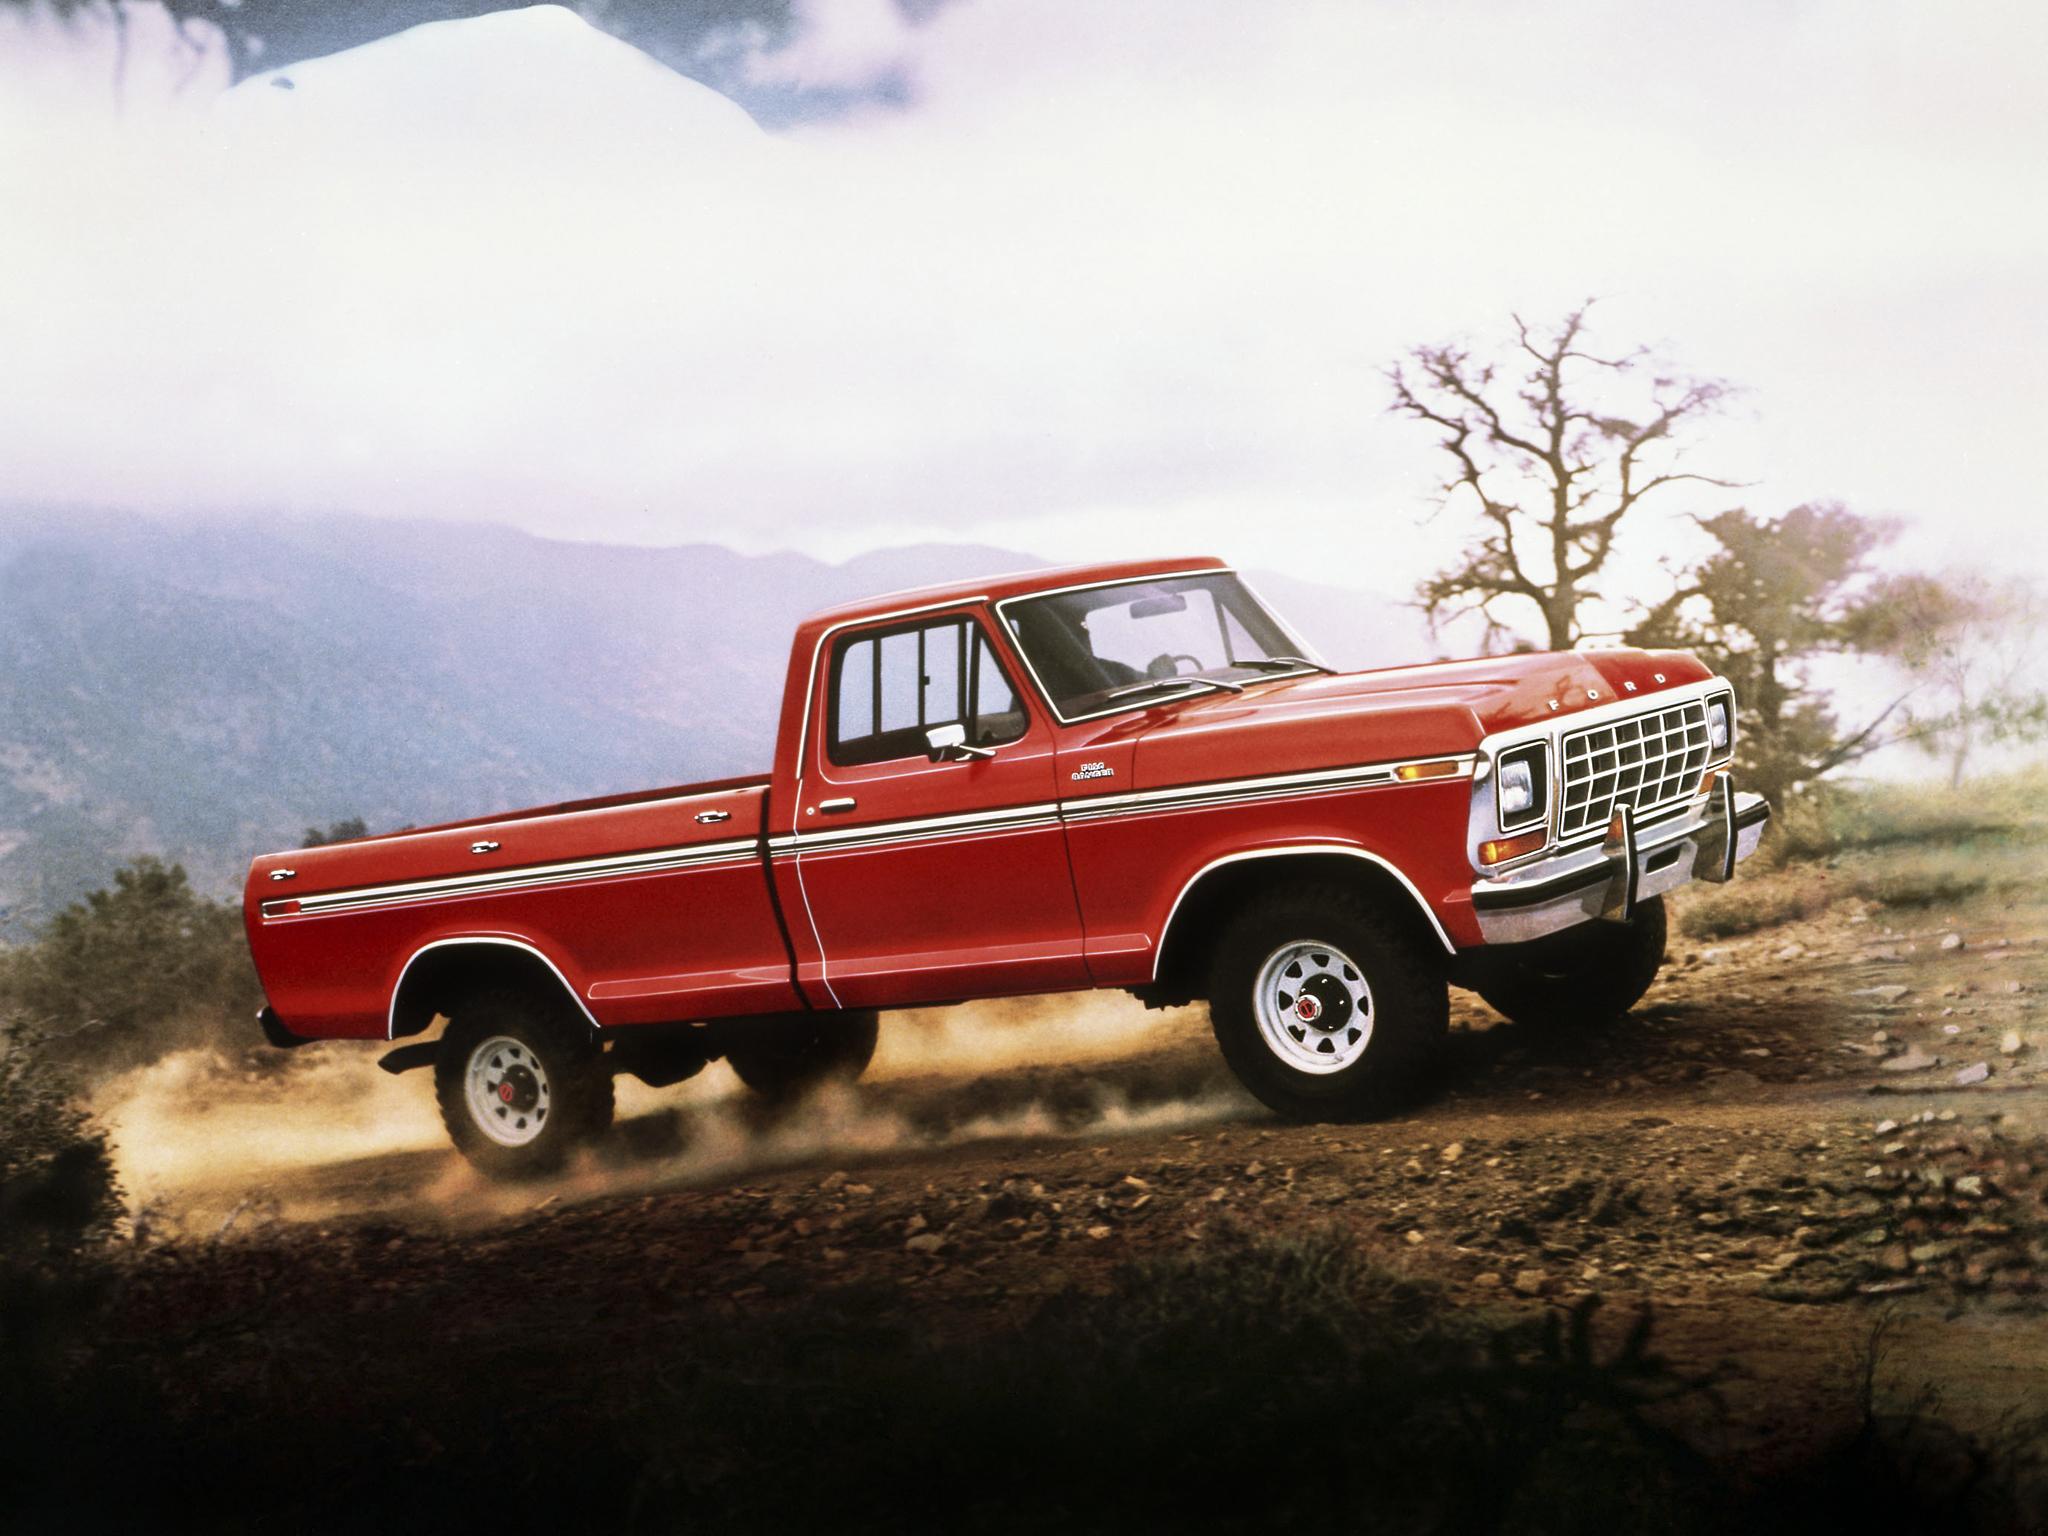 1979 Ford F 150 Ranger 4x4 pickup wallpaper background 2048x1536